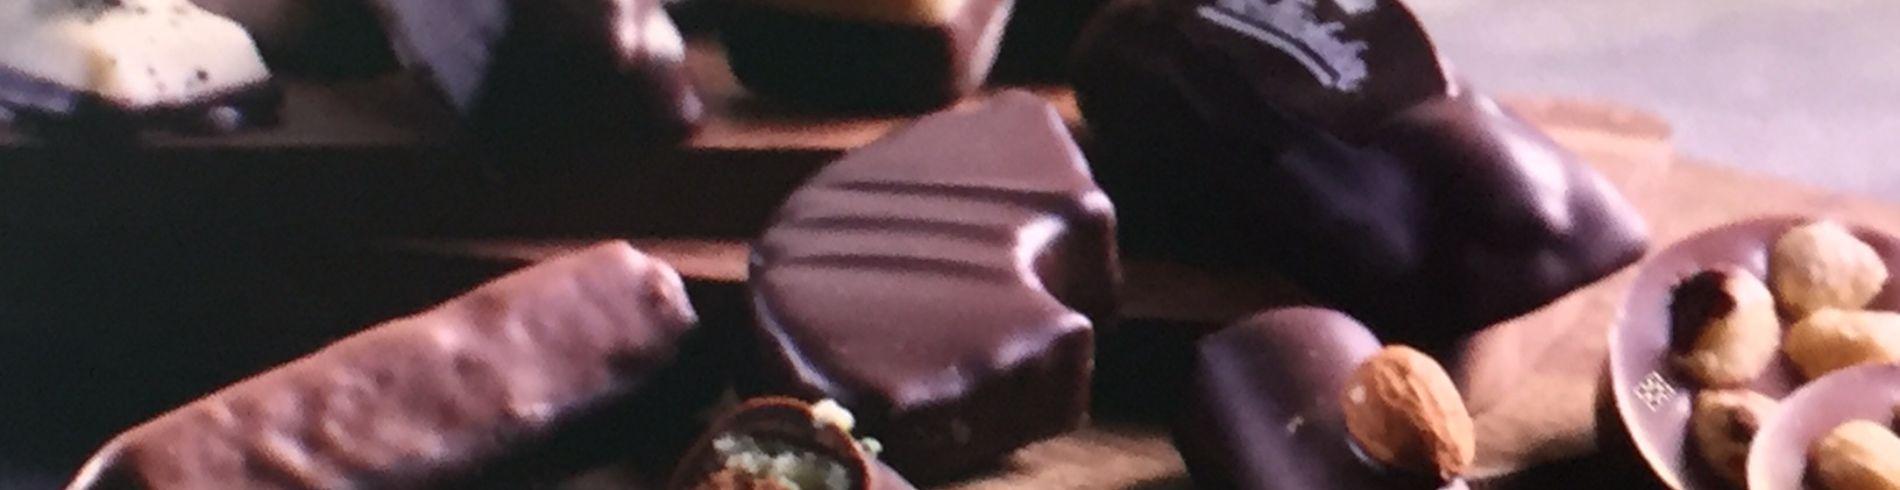 sv.michelsen chokolade cover image